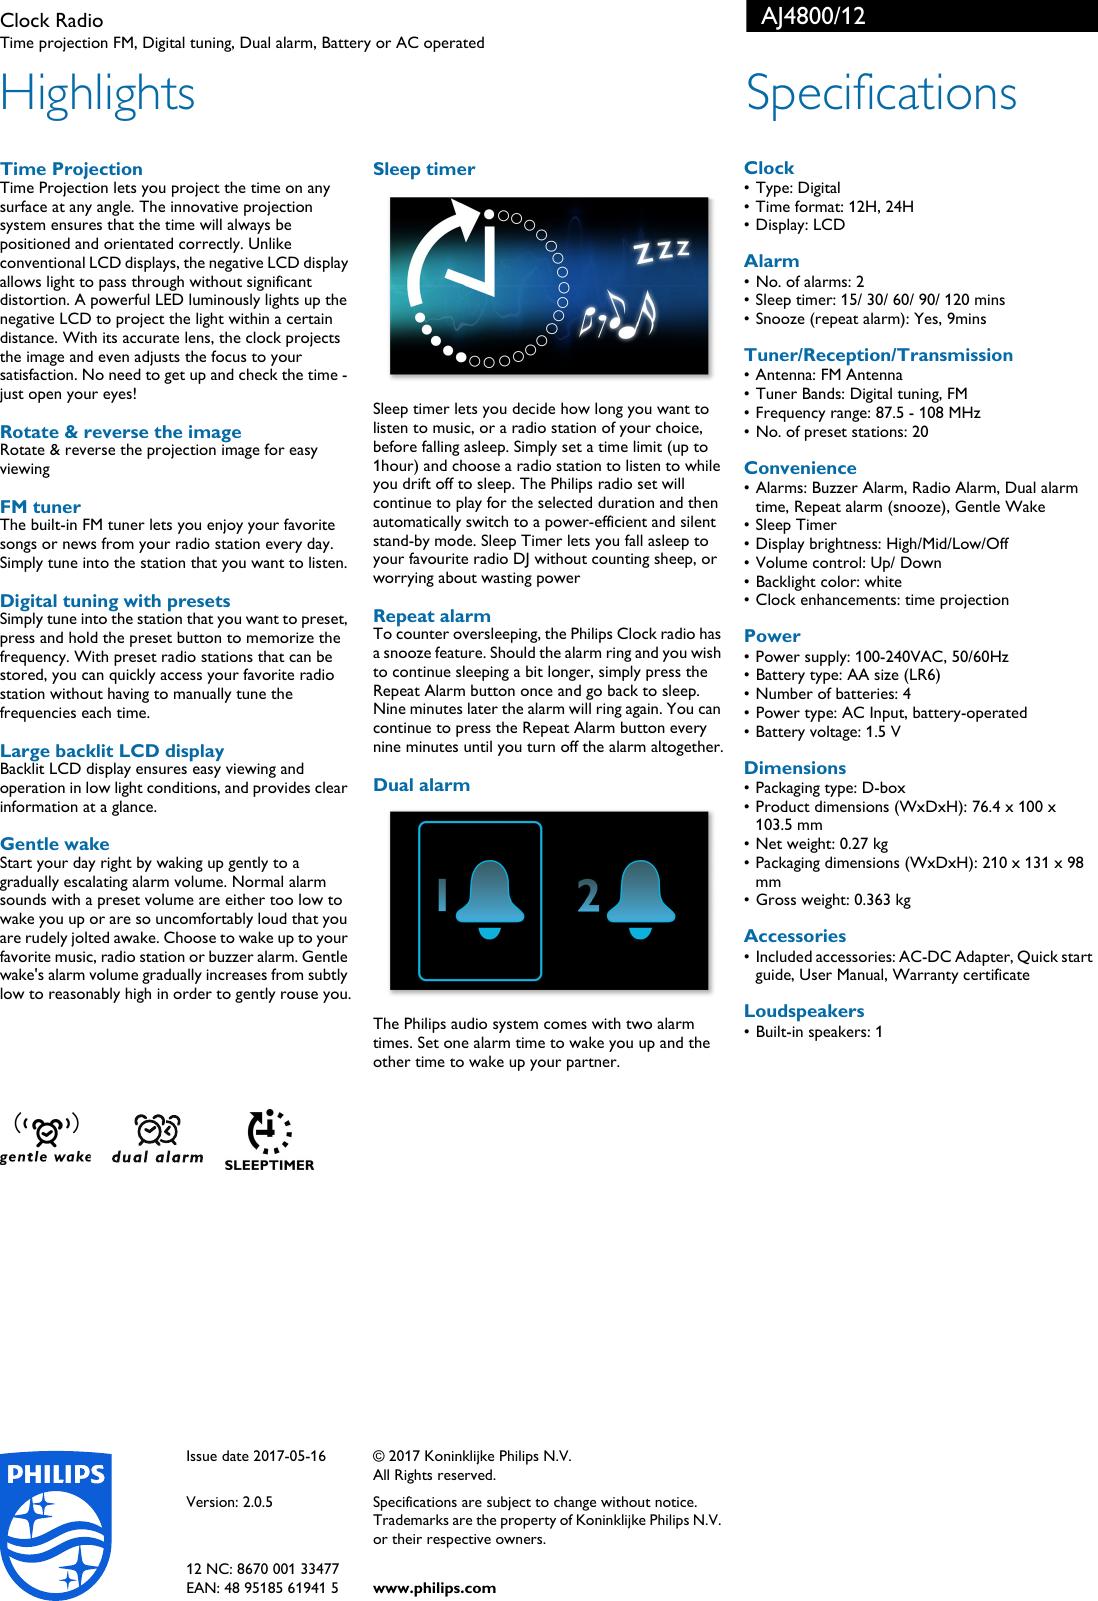 Philips AJ4800/12 Clock Radio User Manual Leaflet Aj4800 12